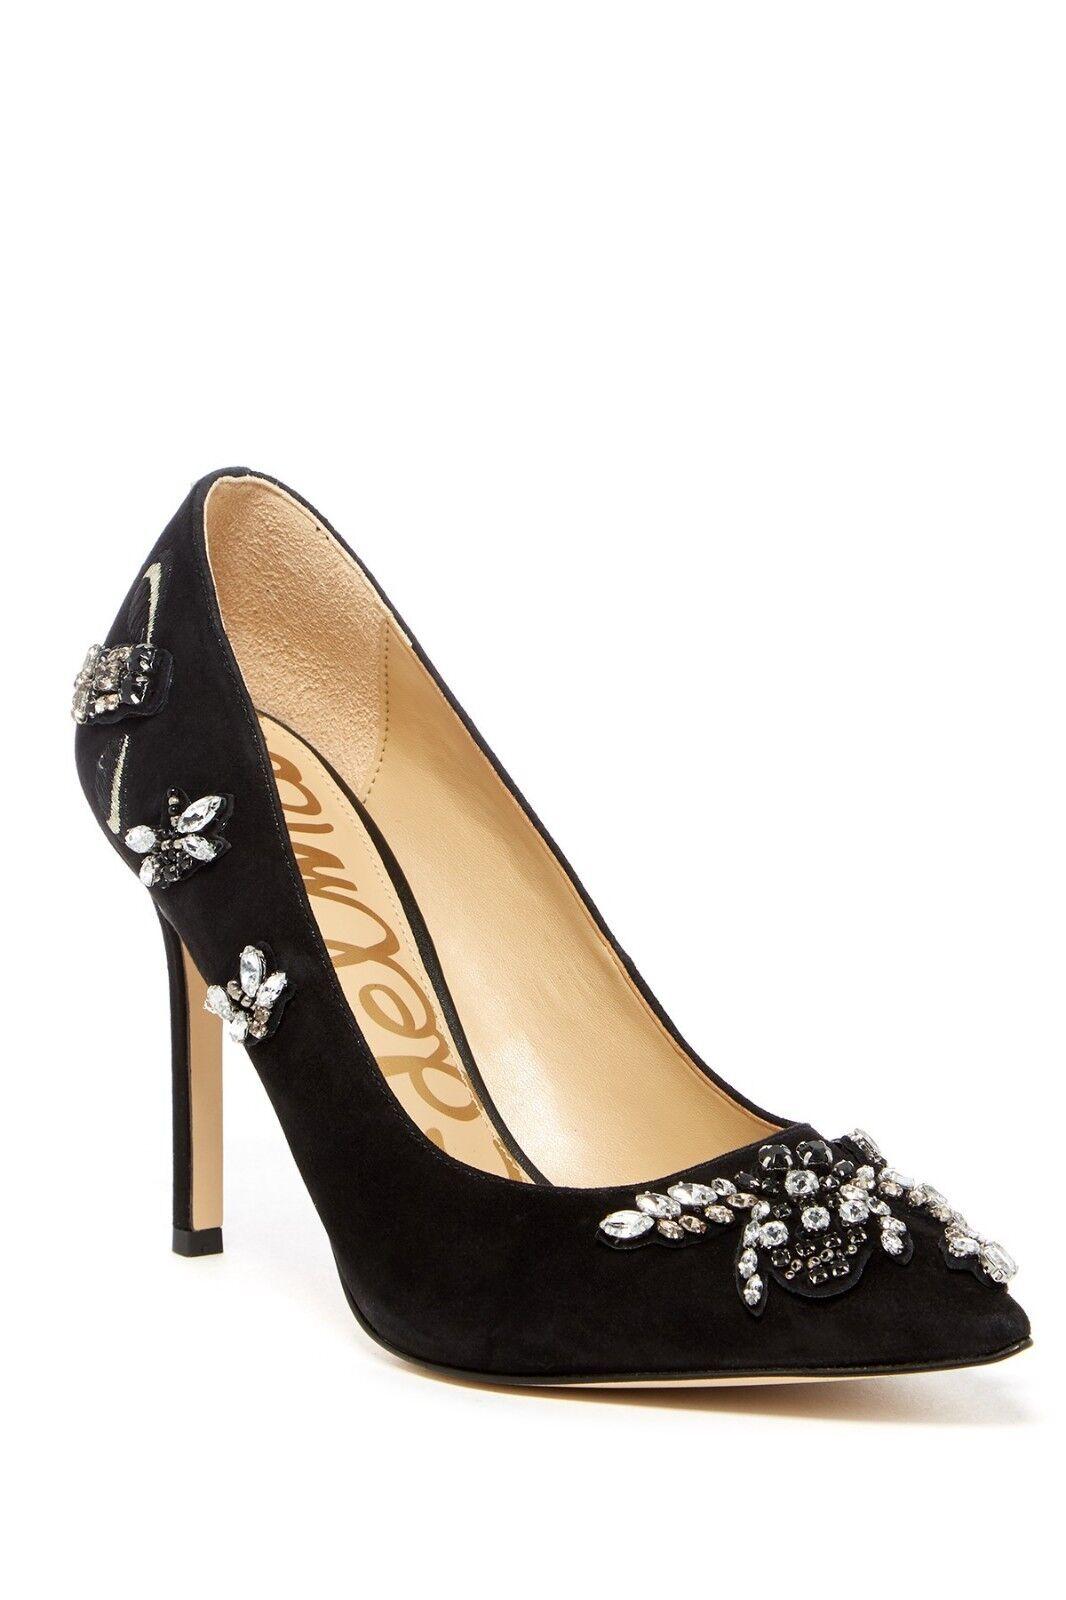 Nouveau Sam Edelhomme Hazel Robe Pompe Jewel Embelli Gems 10,11 en daim noir  Lin